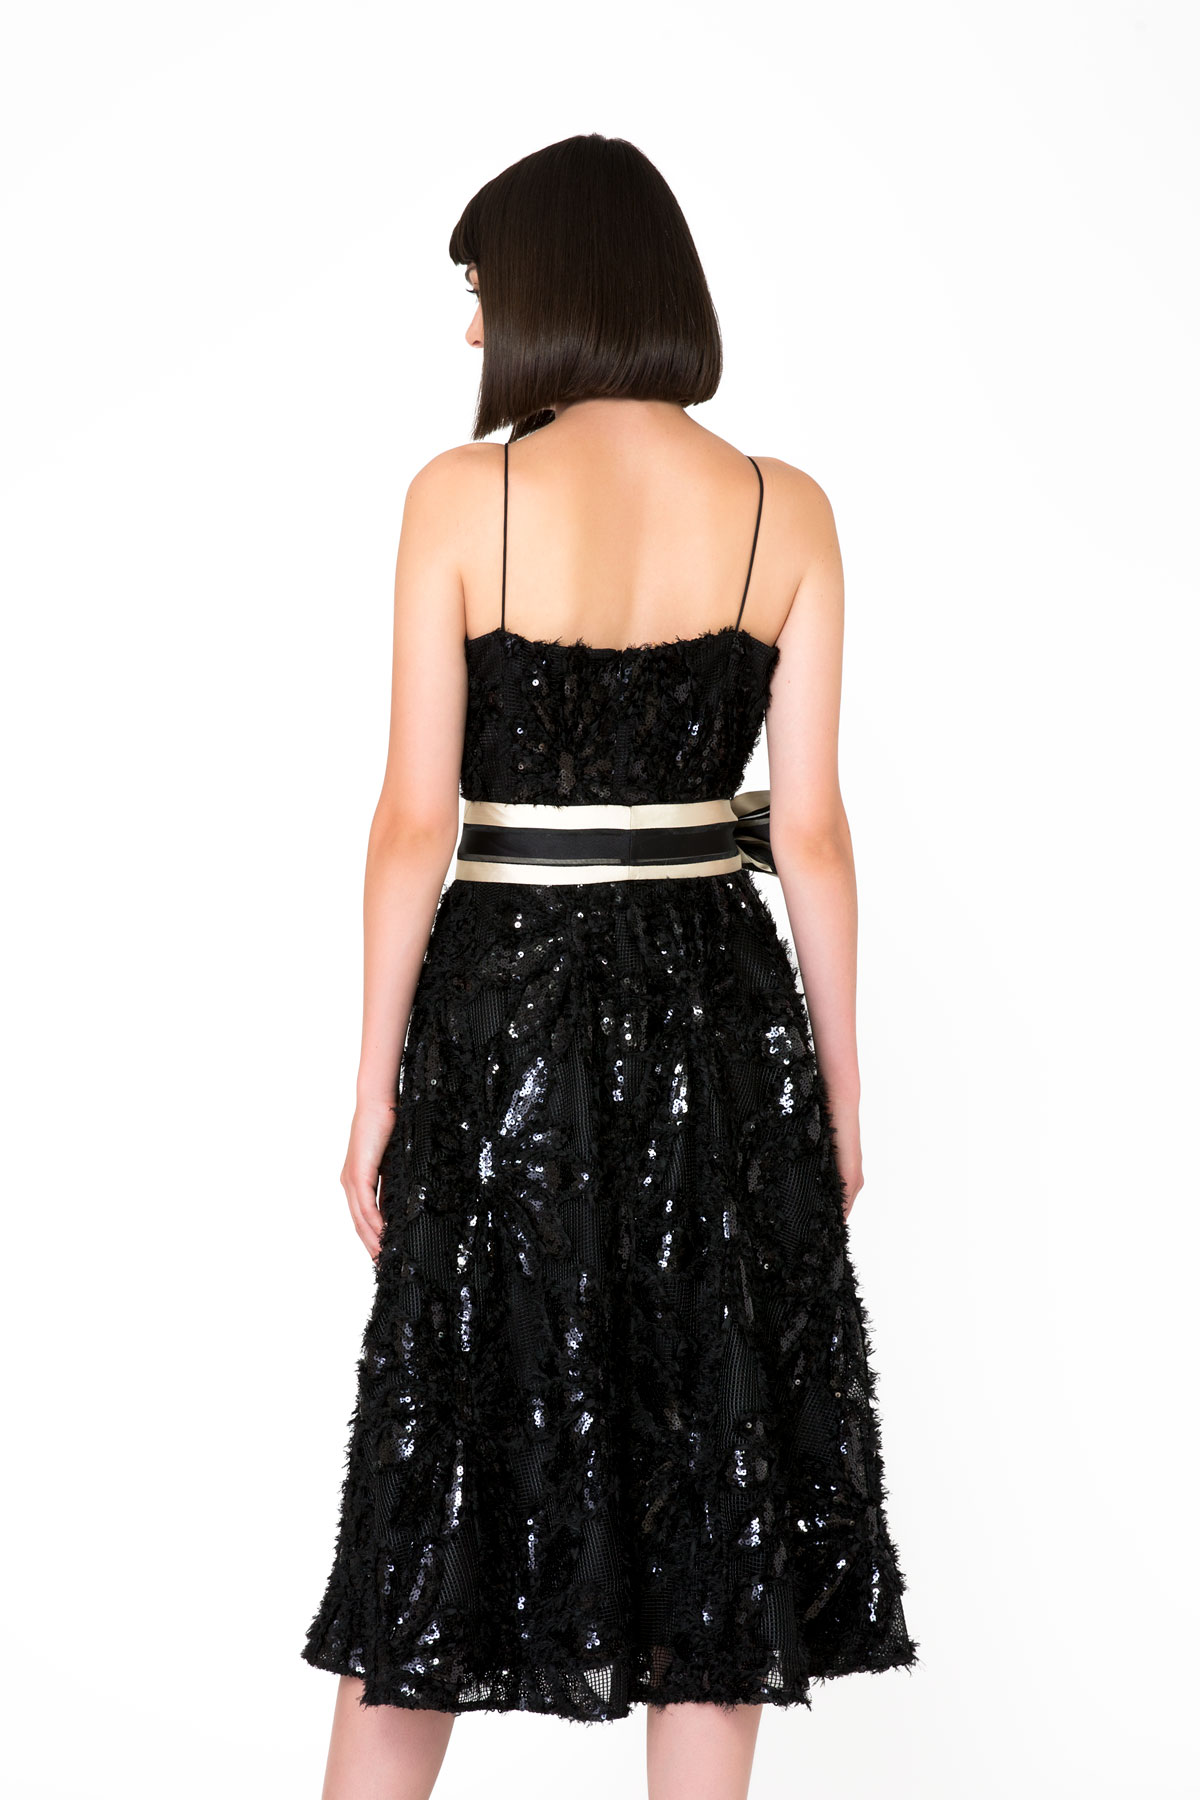 Bow Detailed Thin Strap Black Midi Dress